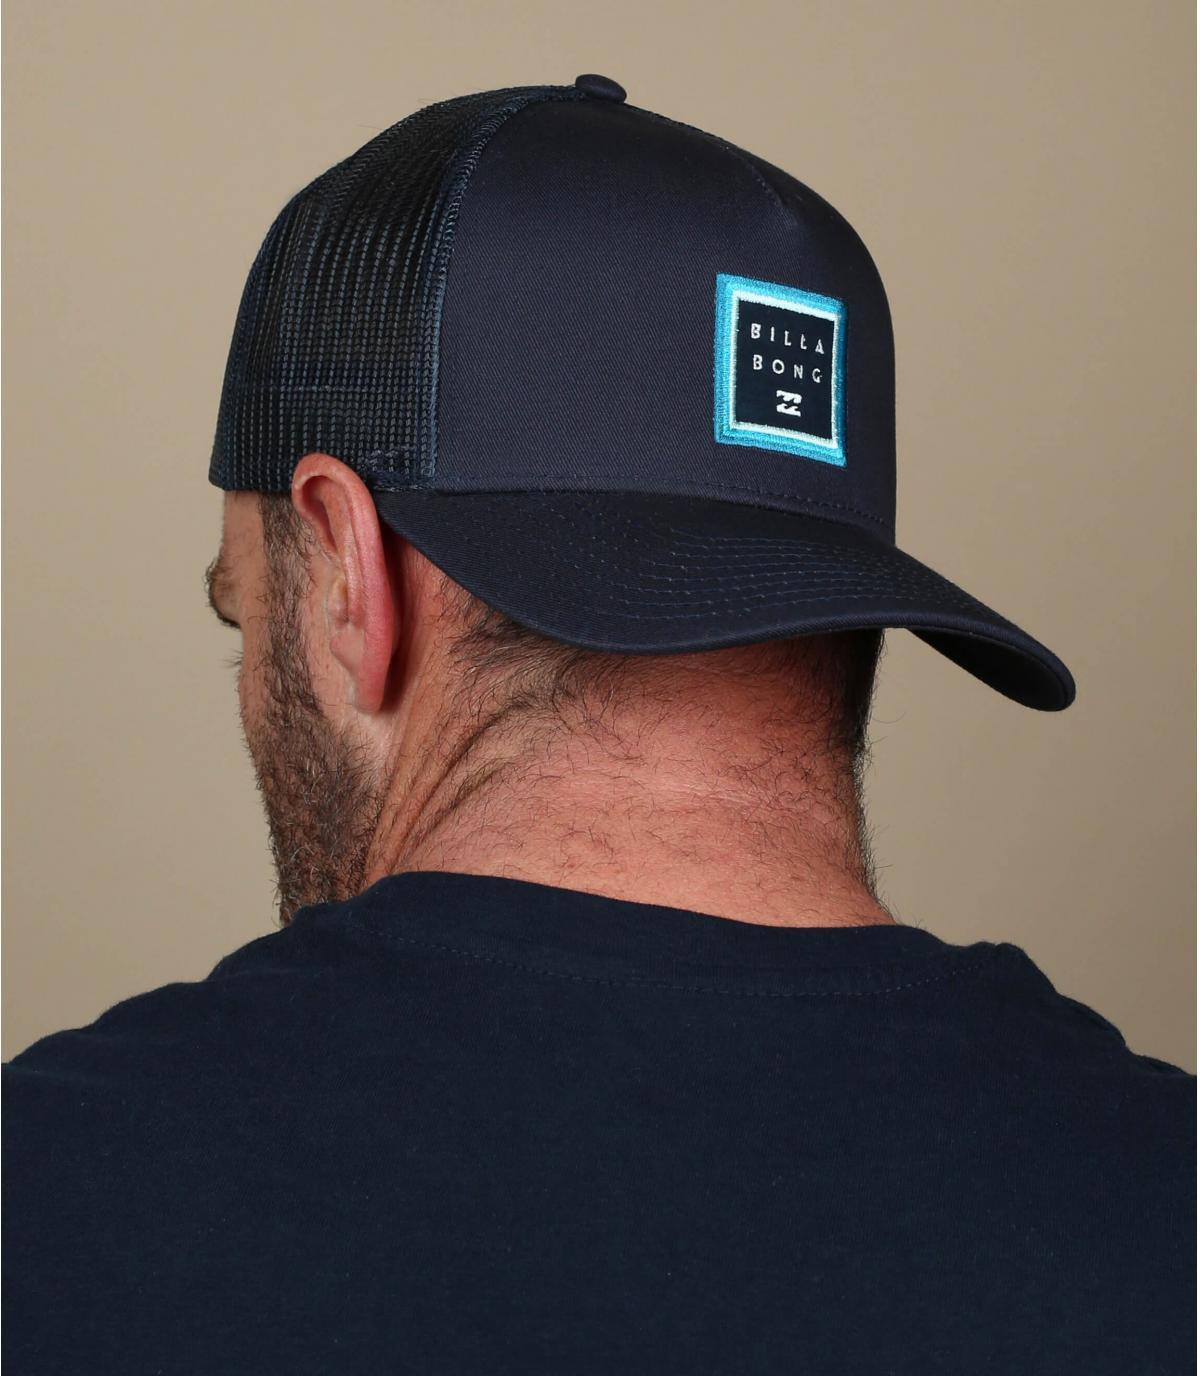 gorra Billabong azul marino